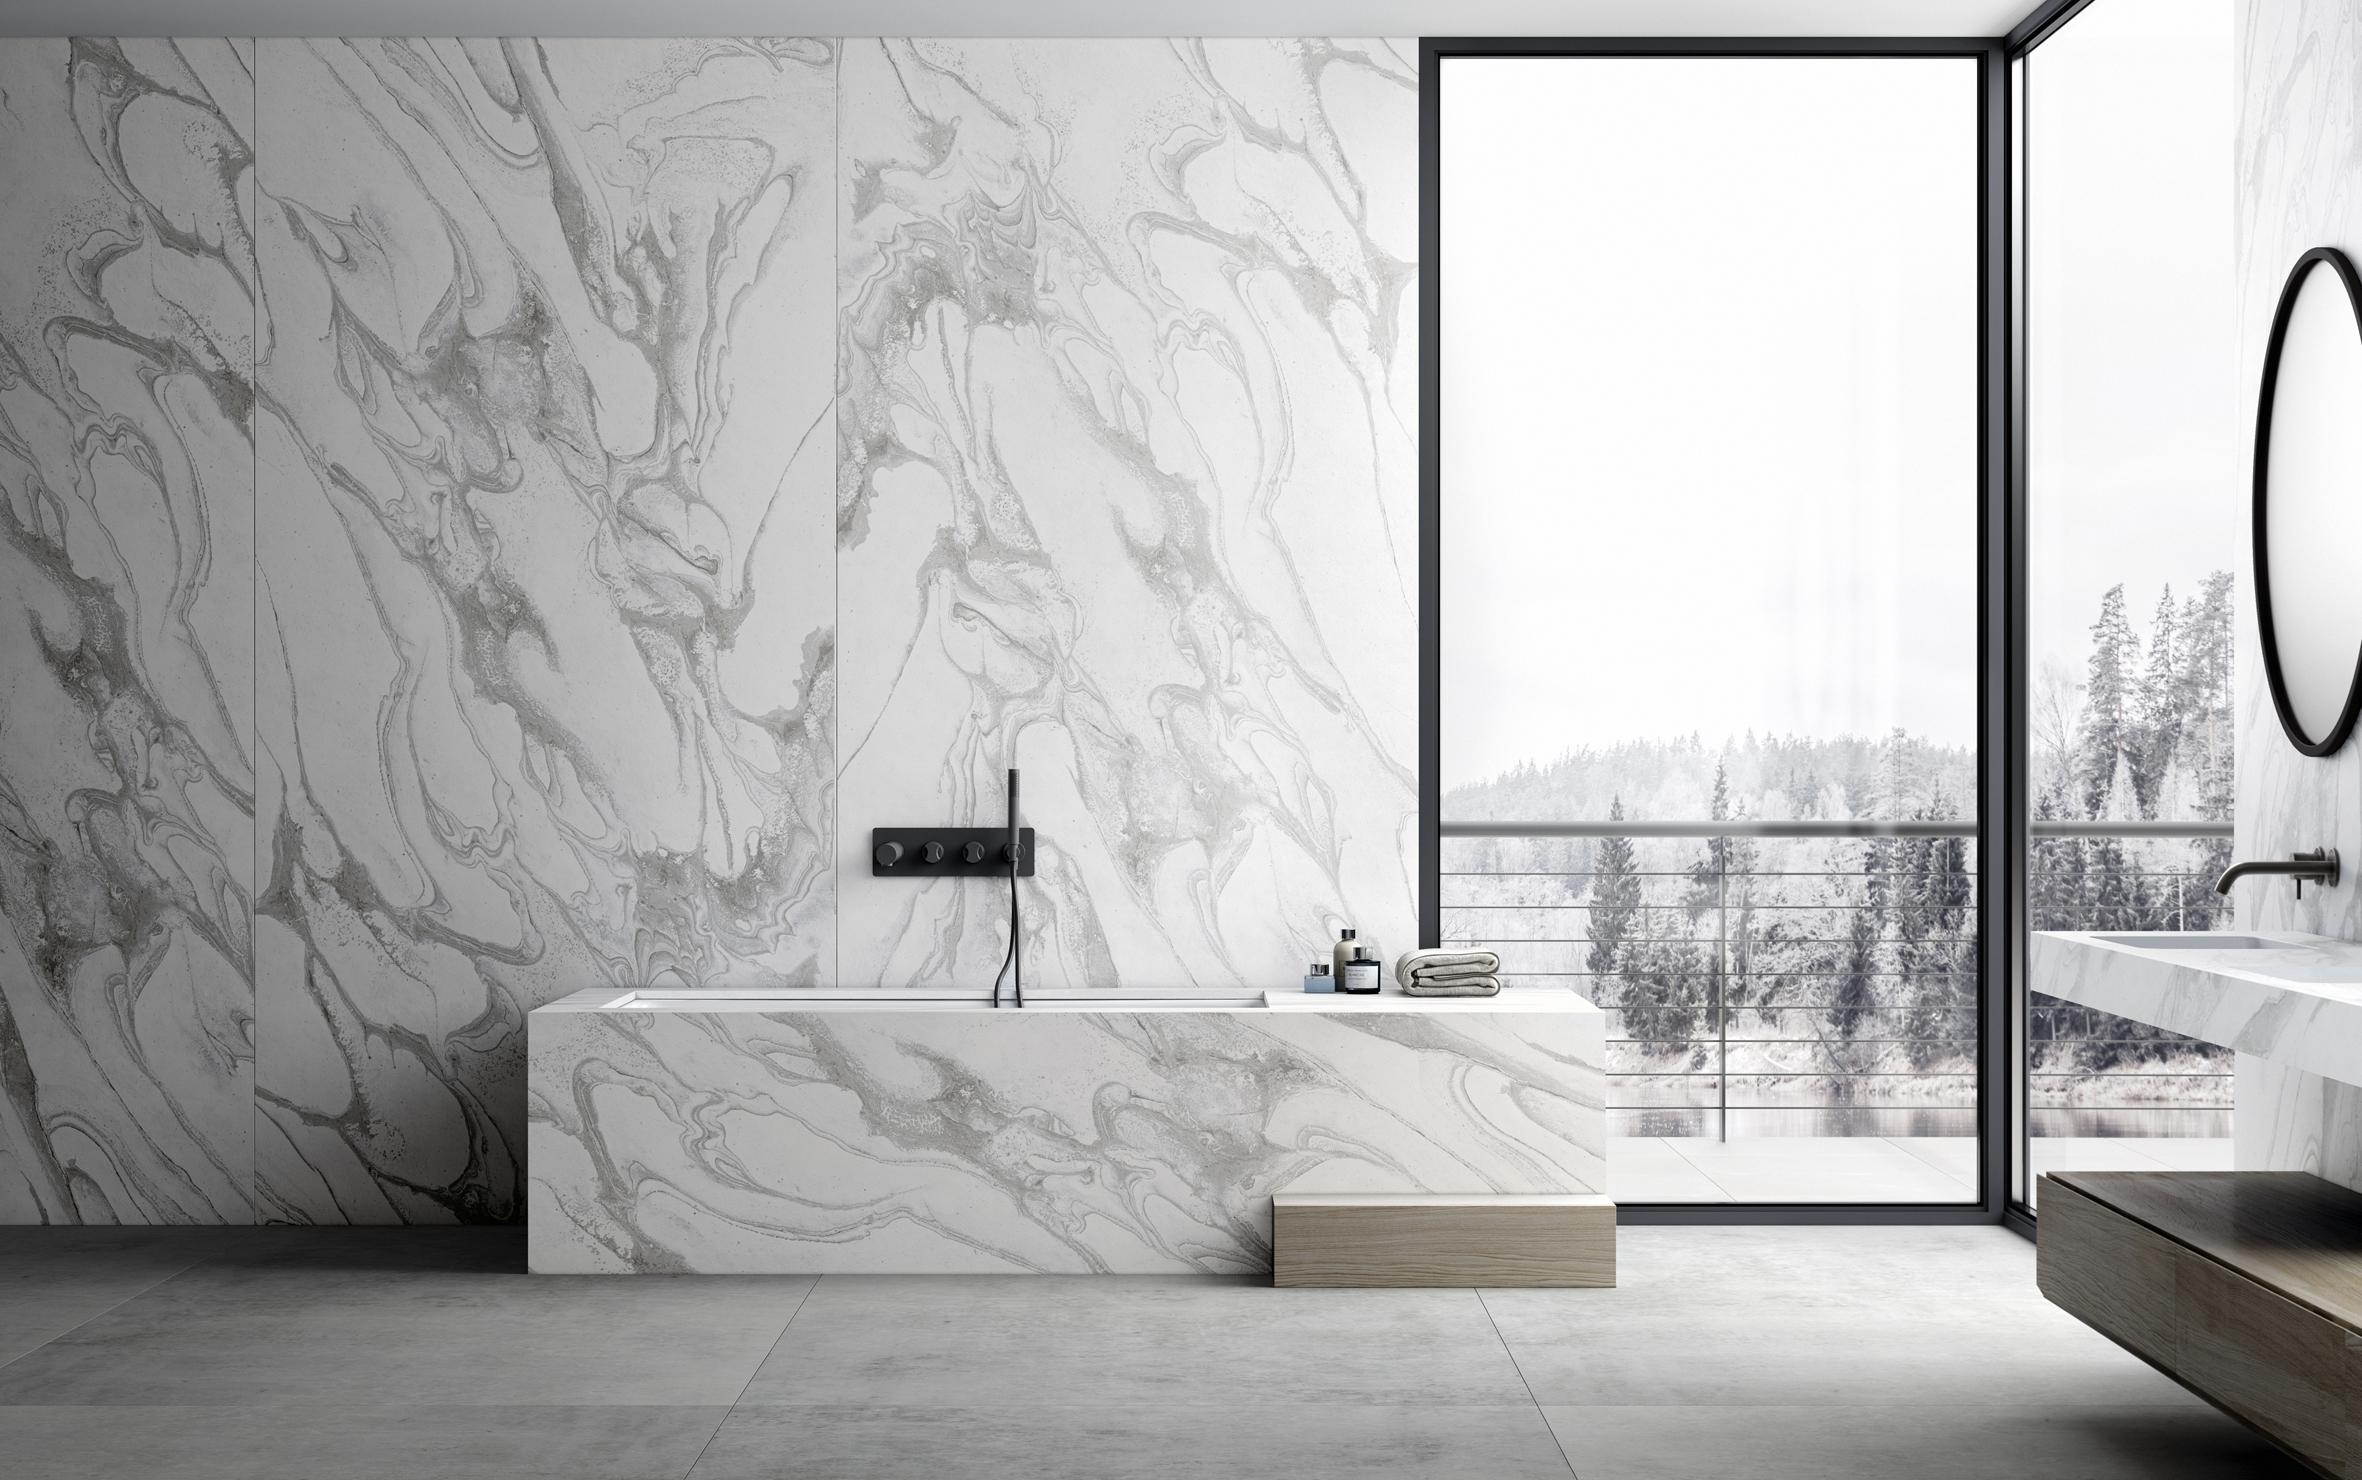 Image of Dekton Liquid Sky Bathroom Lifestyle in Dekton by Cosentino Shortlisted in BKU Awards 2021 - Cosentino